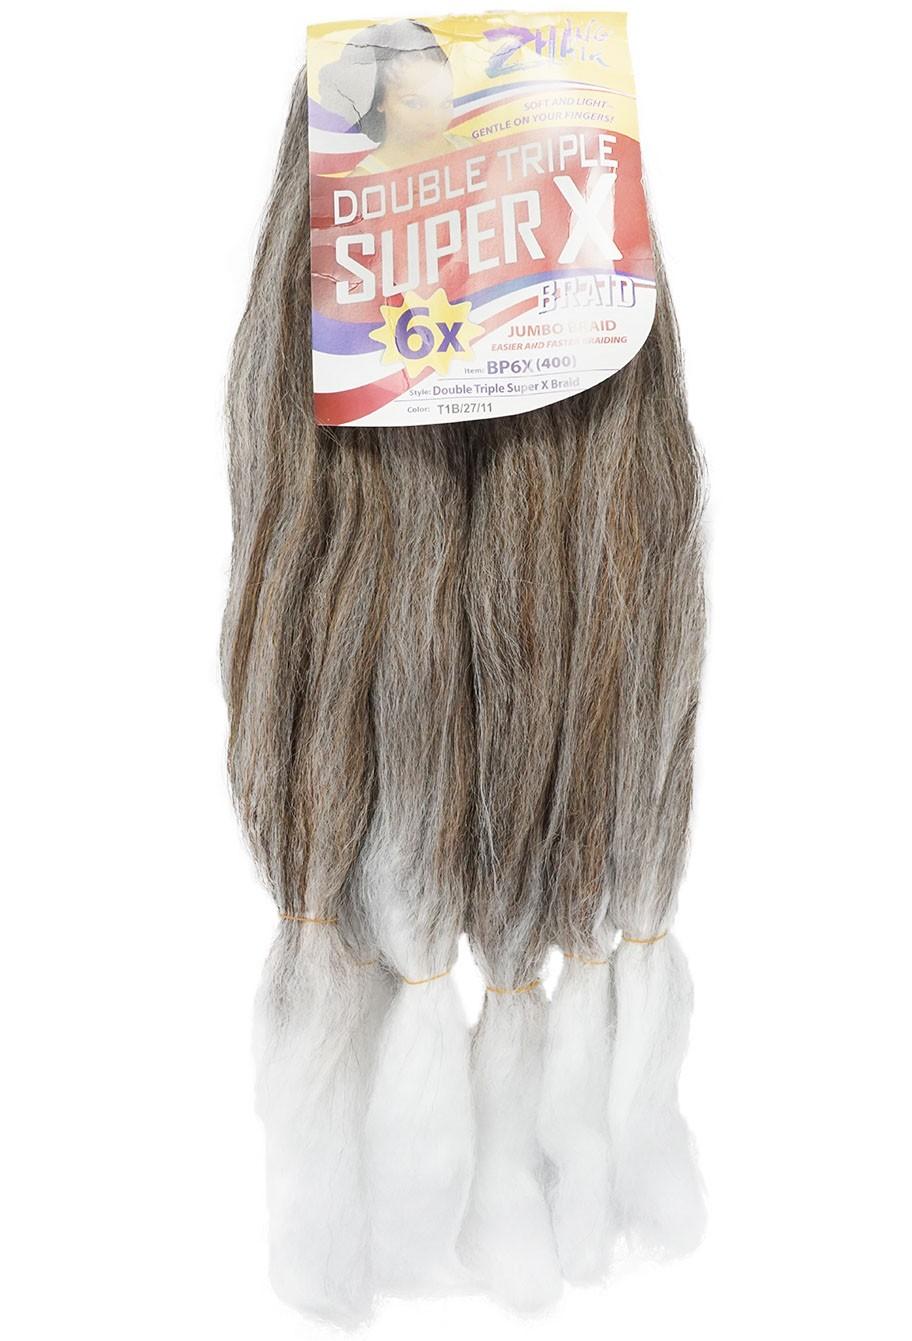 Cabelo Sintético - Zhang hair jumbo - Super X (400g) - Cor: Preto com Mel e Branco (T1B/27/11)